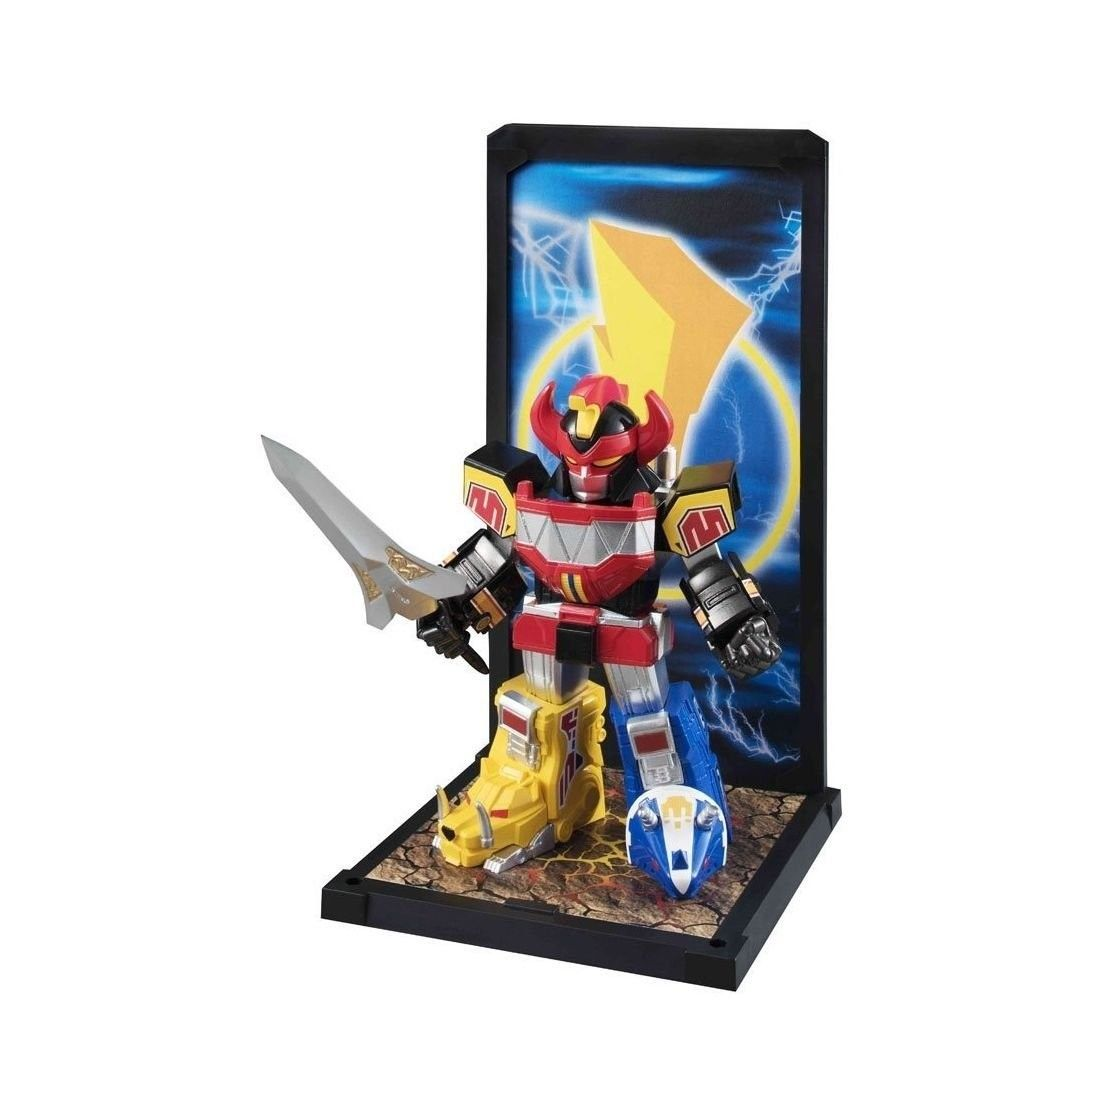 Miniatura Megazord: Power Rangers Tamashii Buddies - Bandai